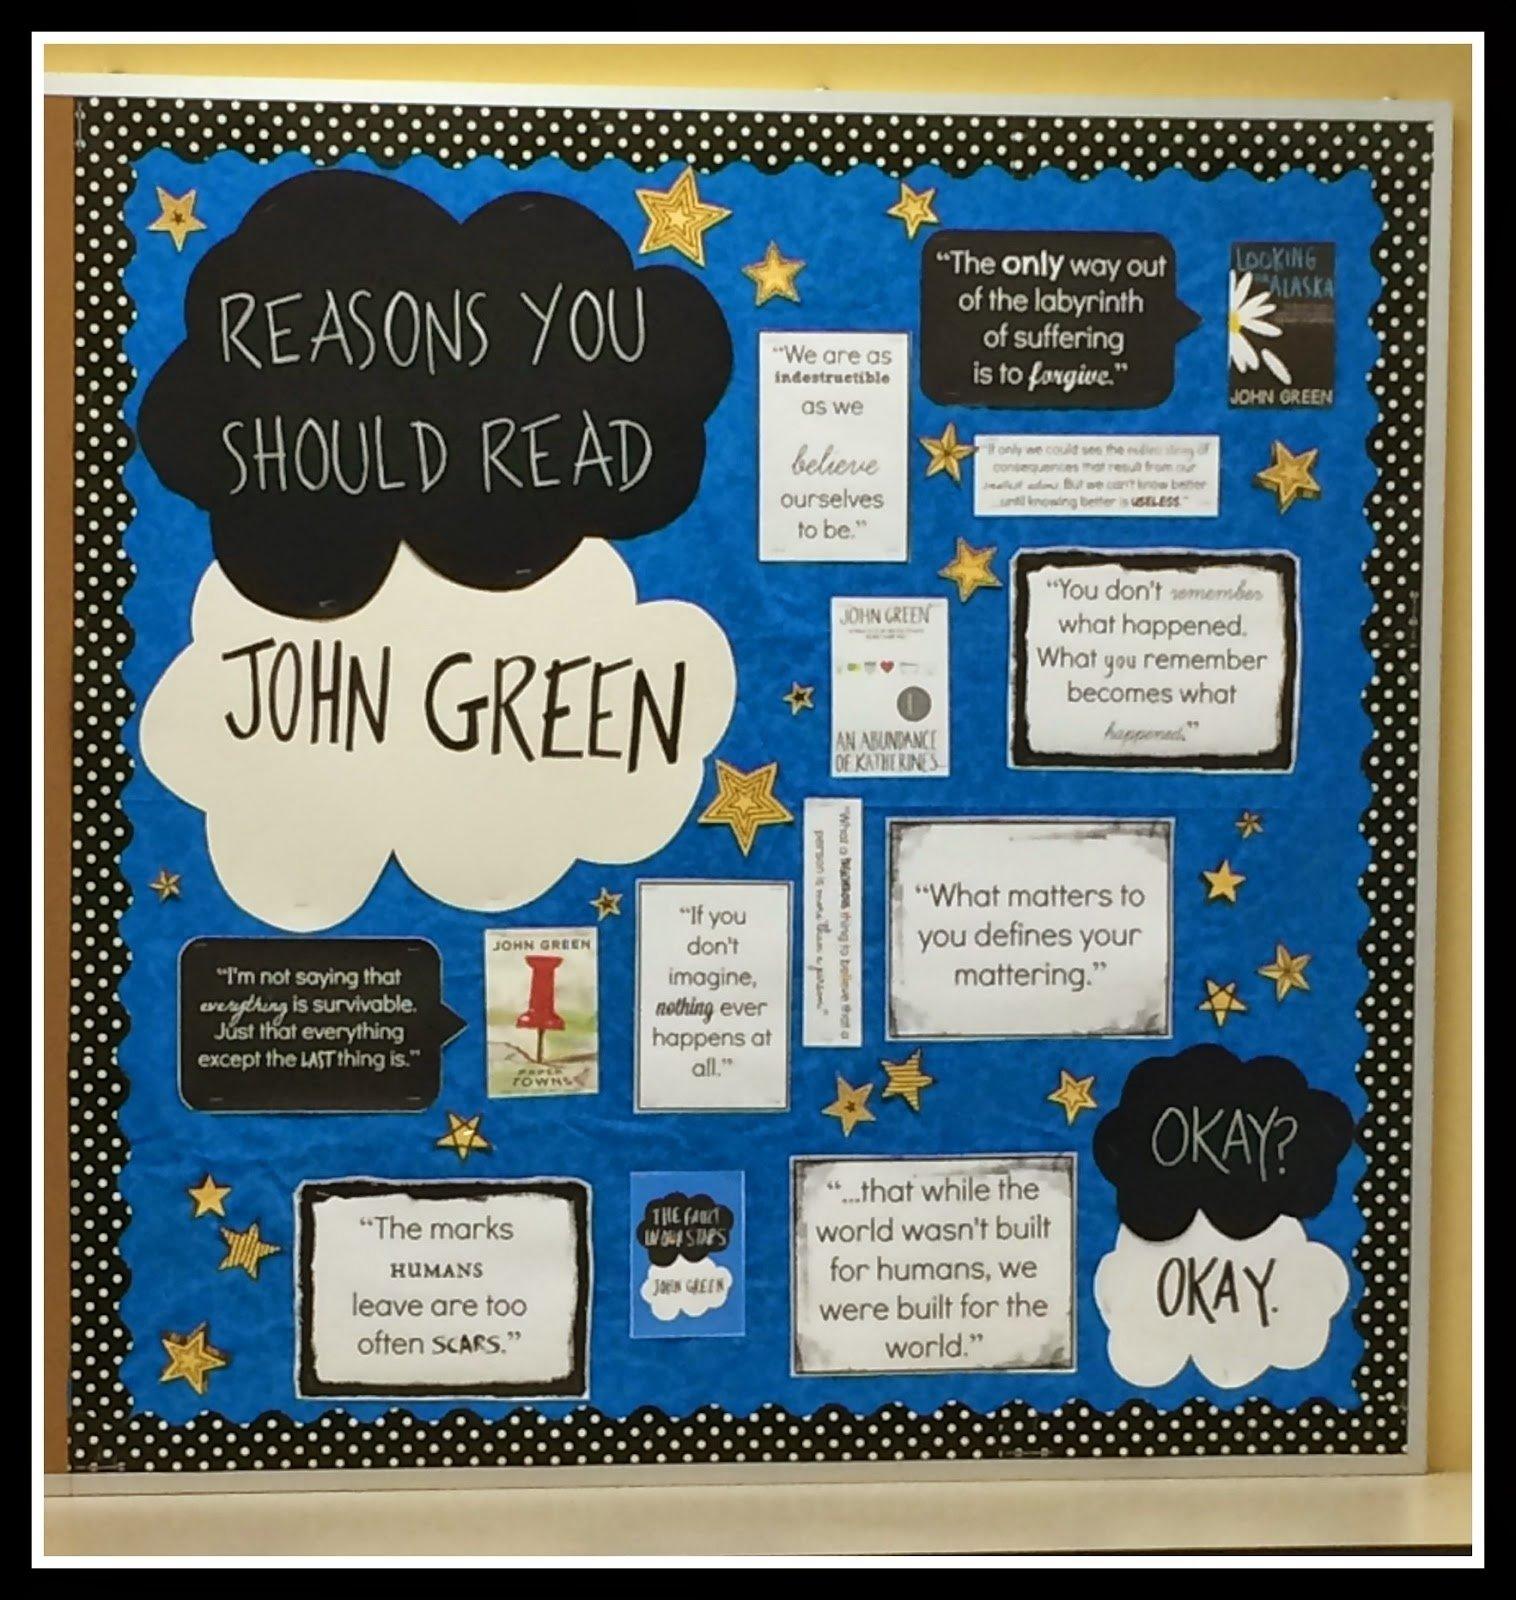 10 Awesome High School Book Report Ideas high school book report ideas romeo and juliet persuasive essay 2020